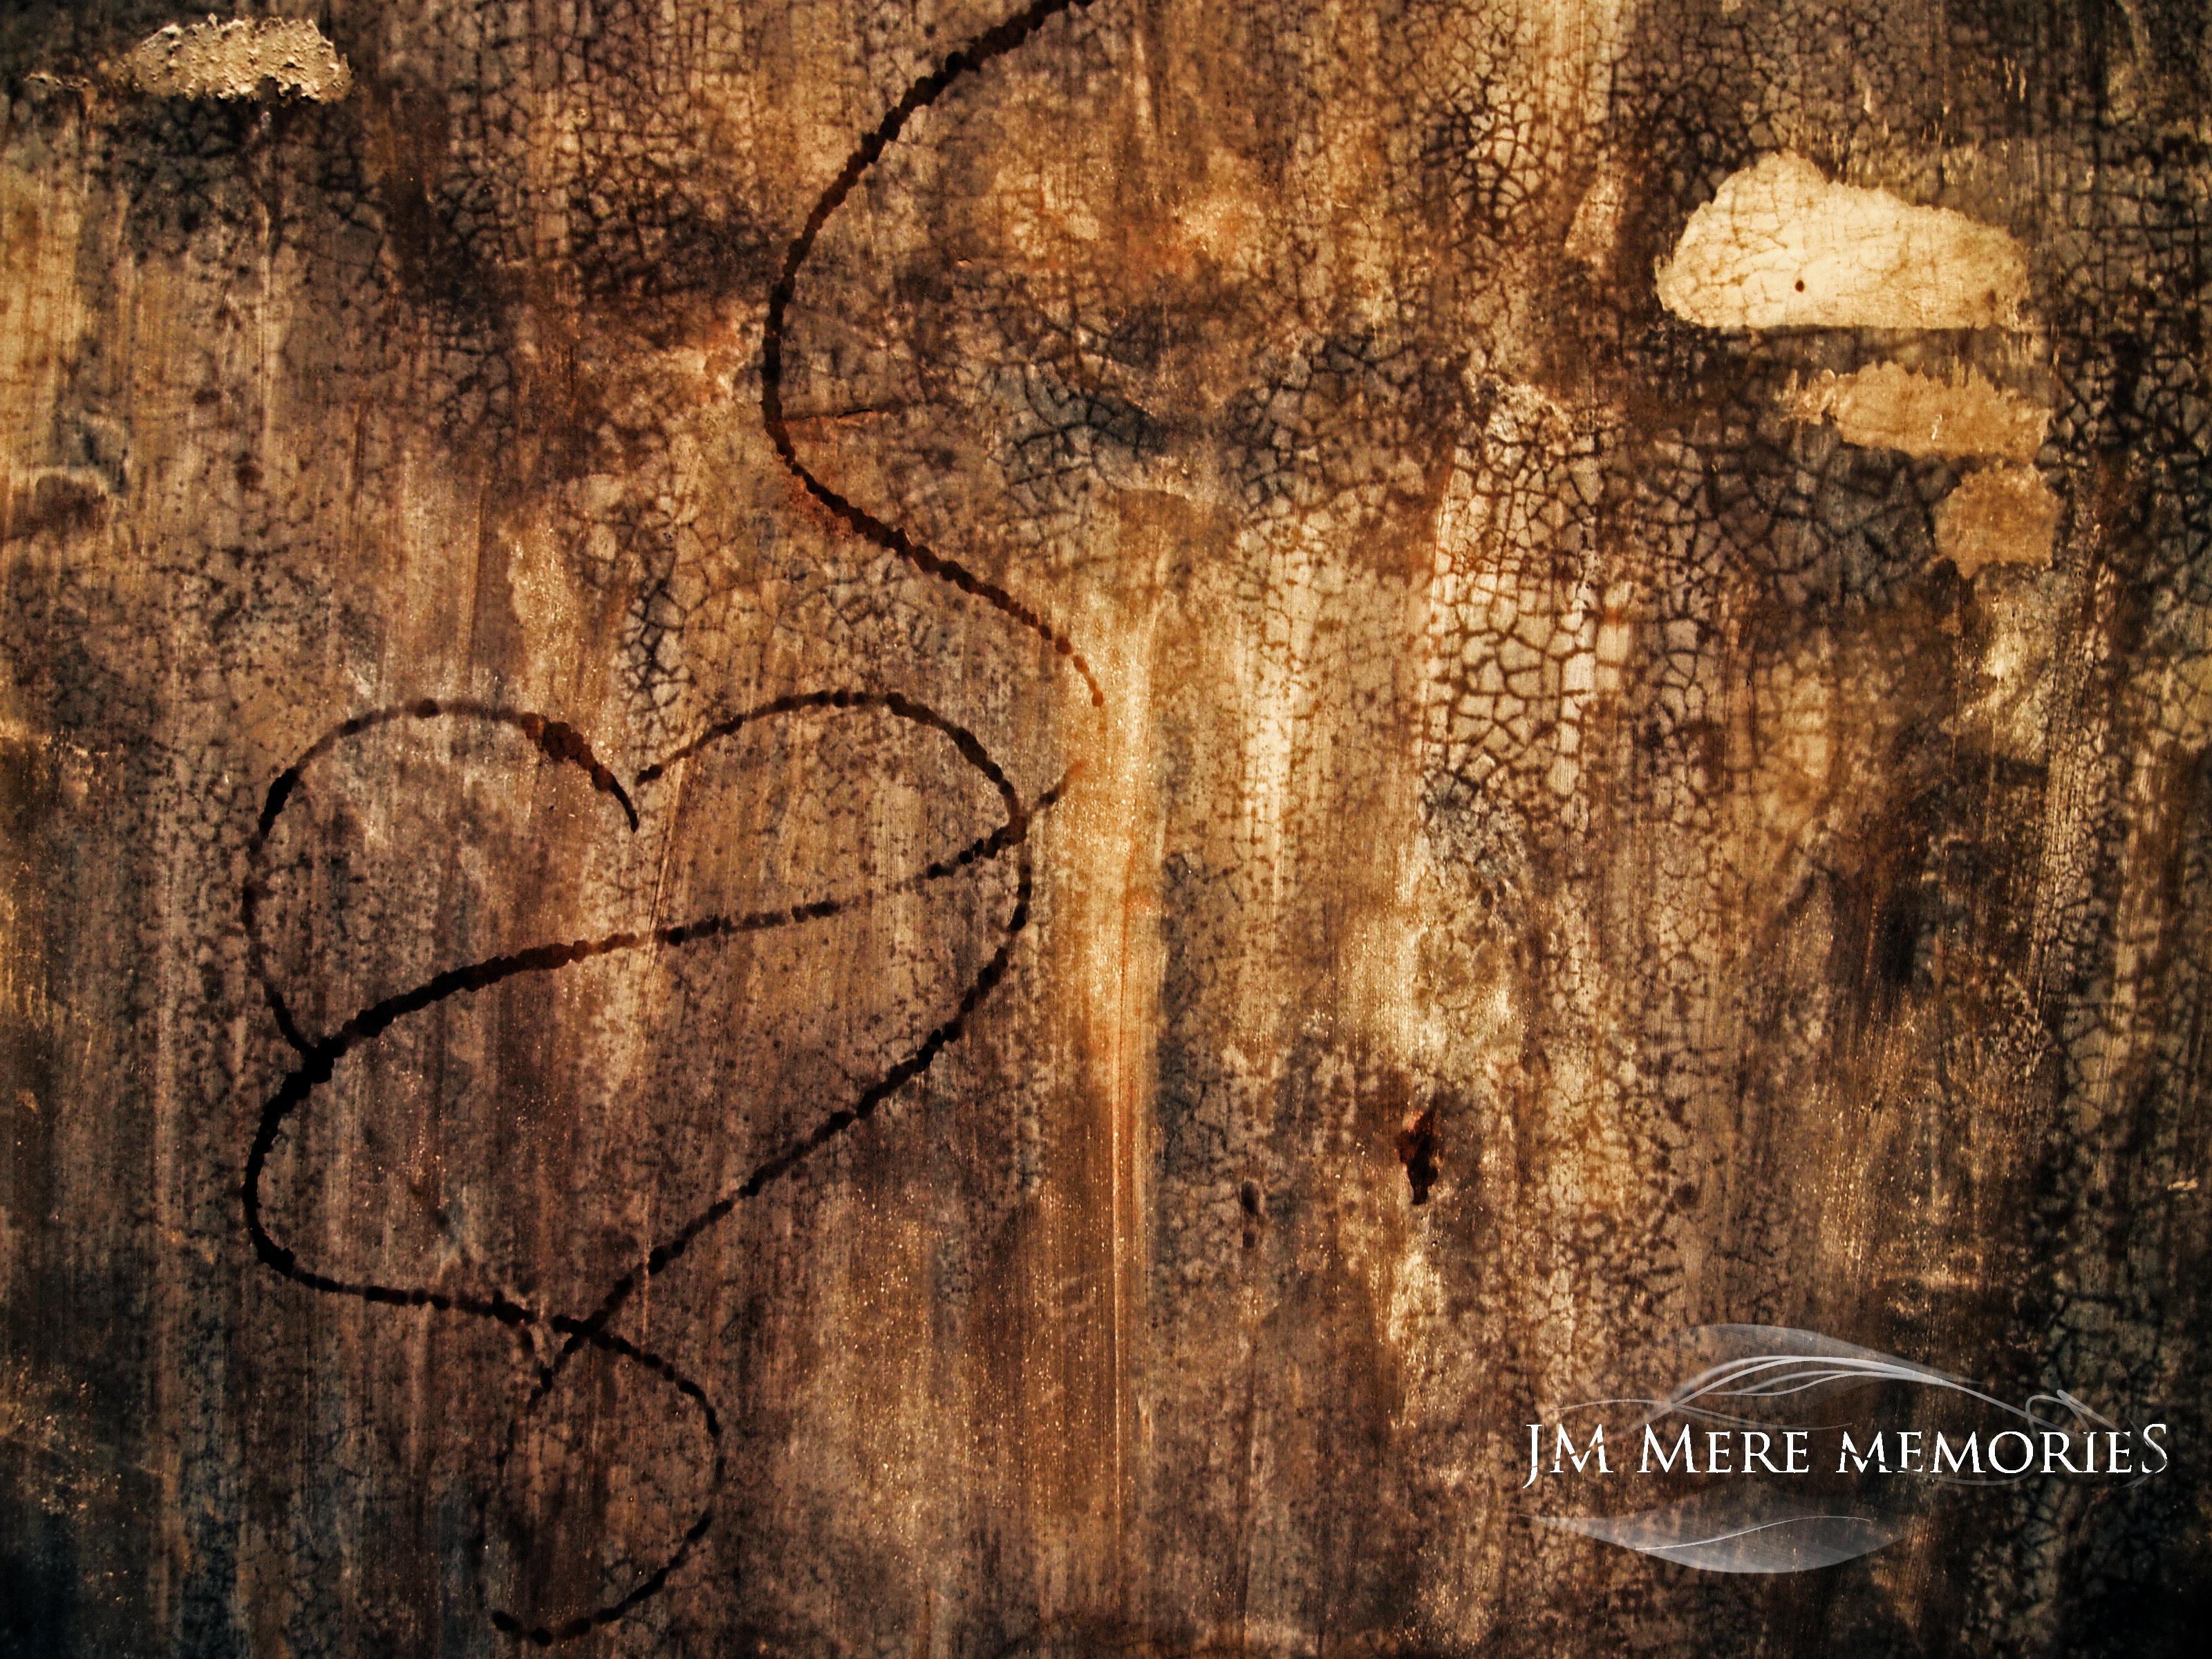 Free Love High Quality Wallpaper Id 306754 For Hd 3200x2400 Desktop